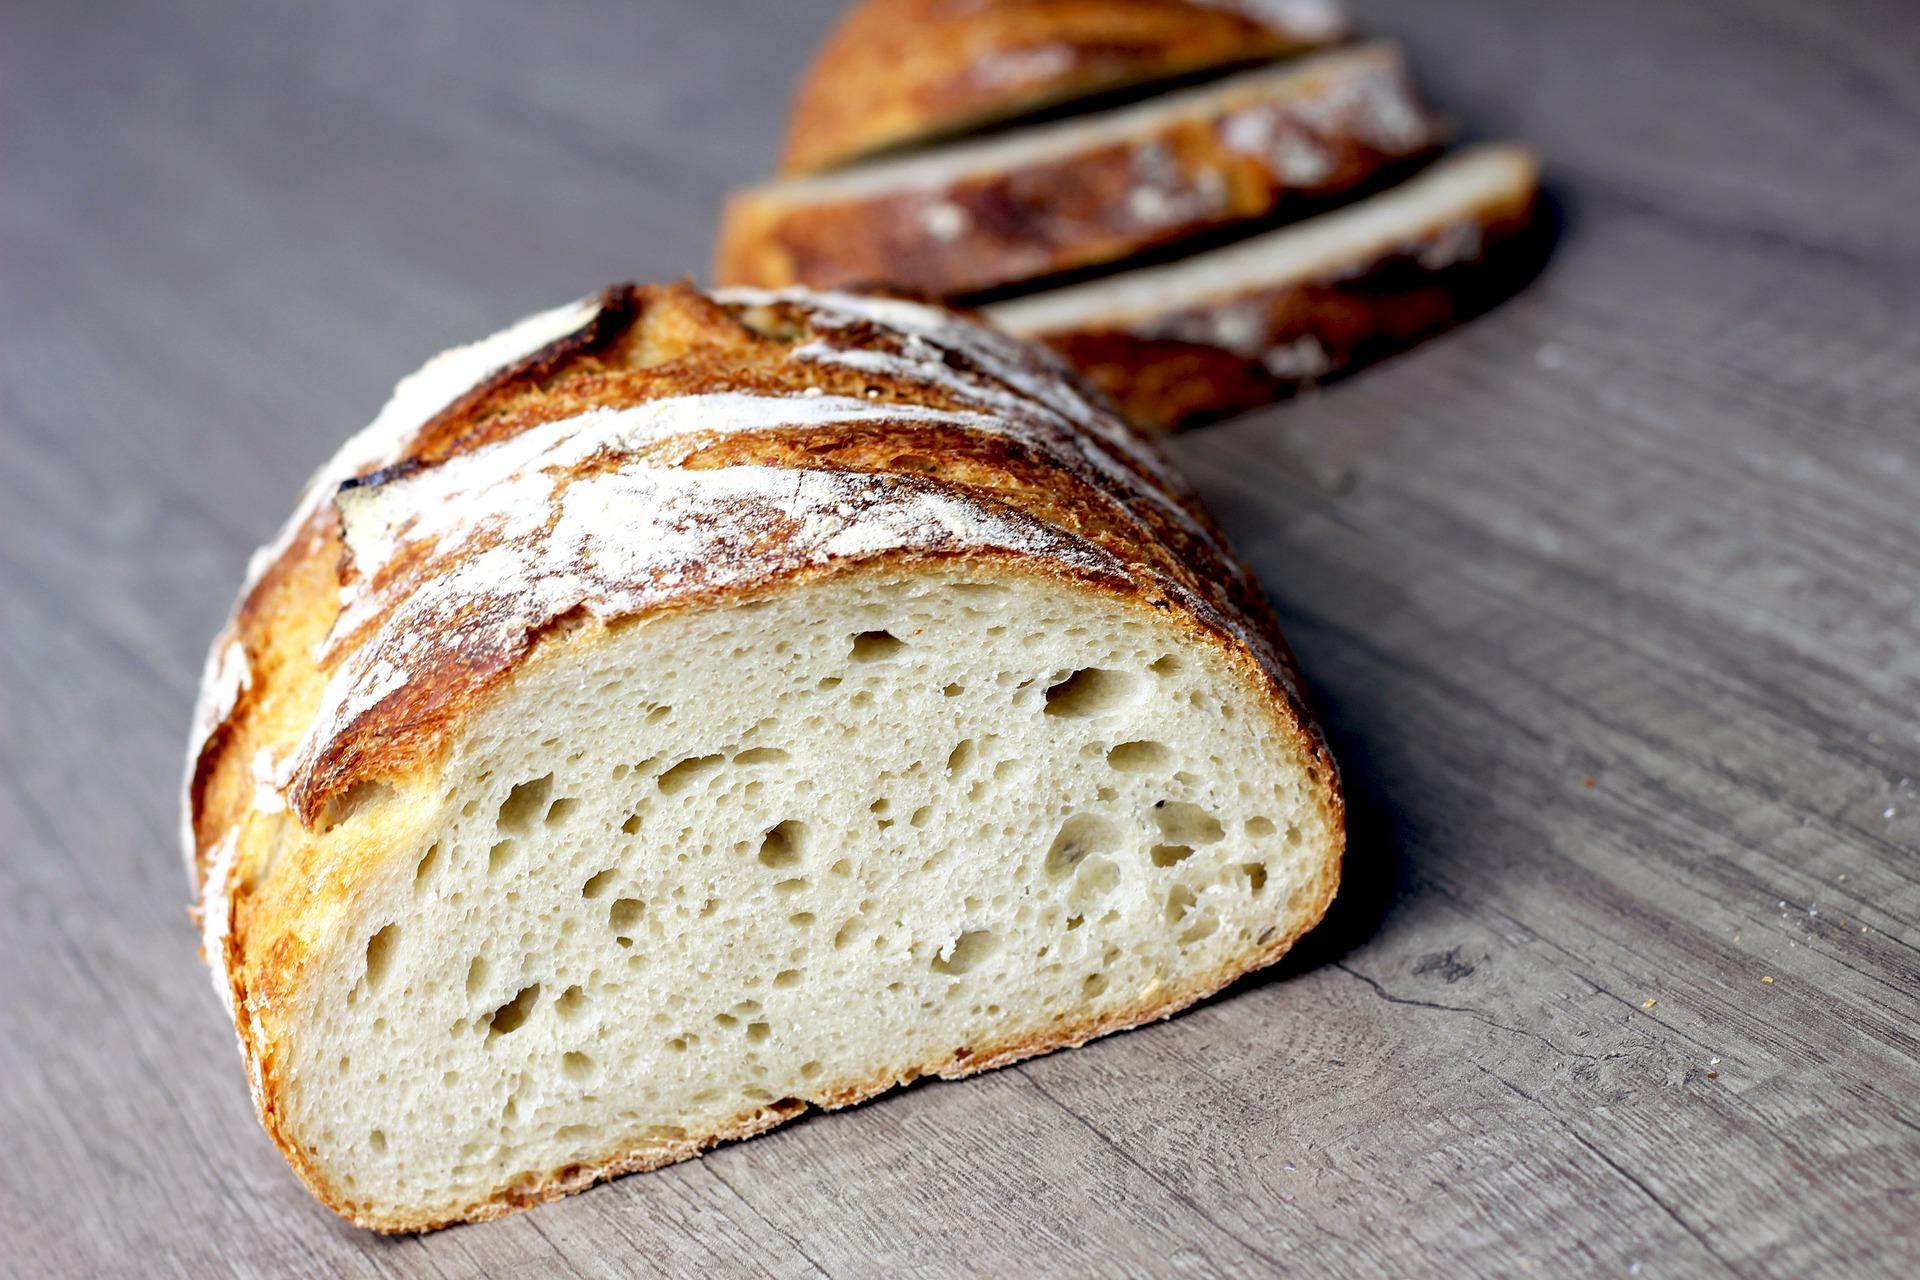 Sourdough bread with starter